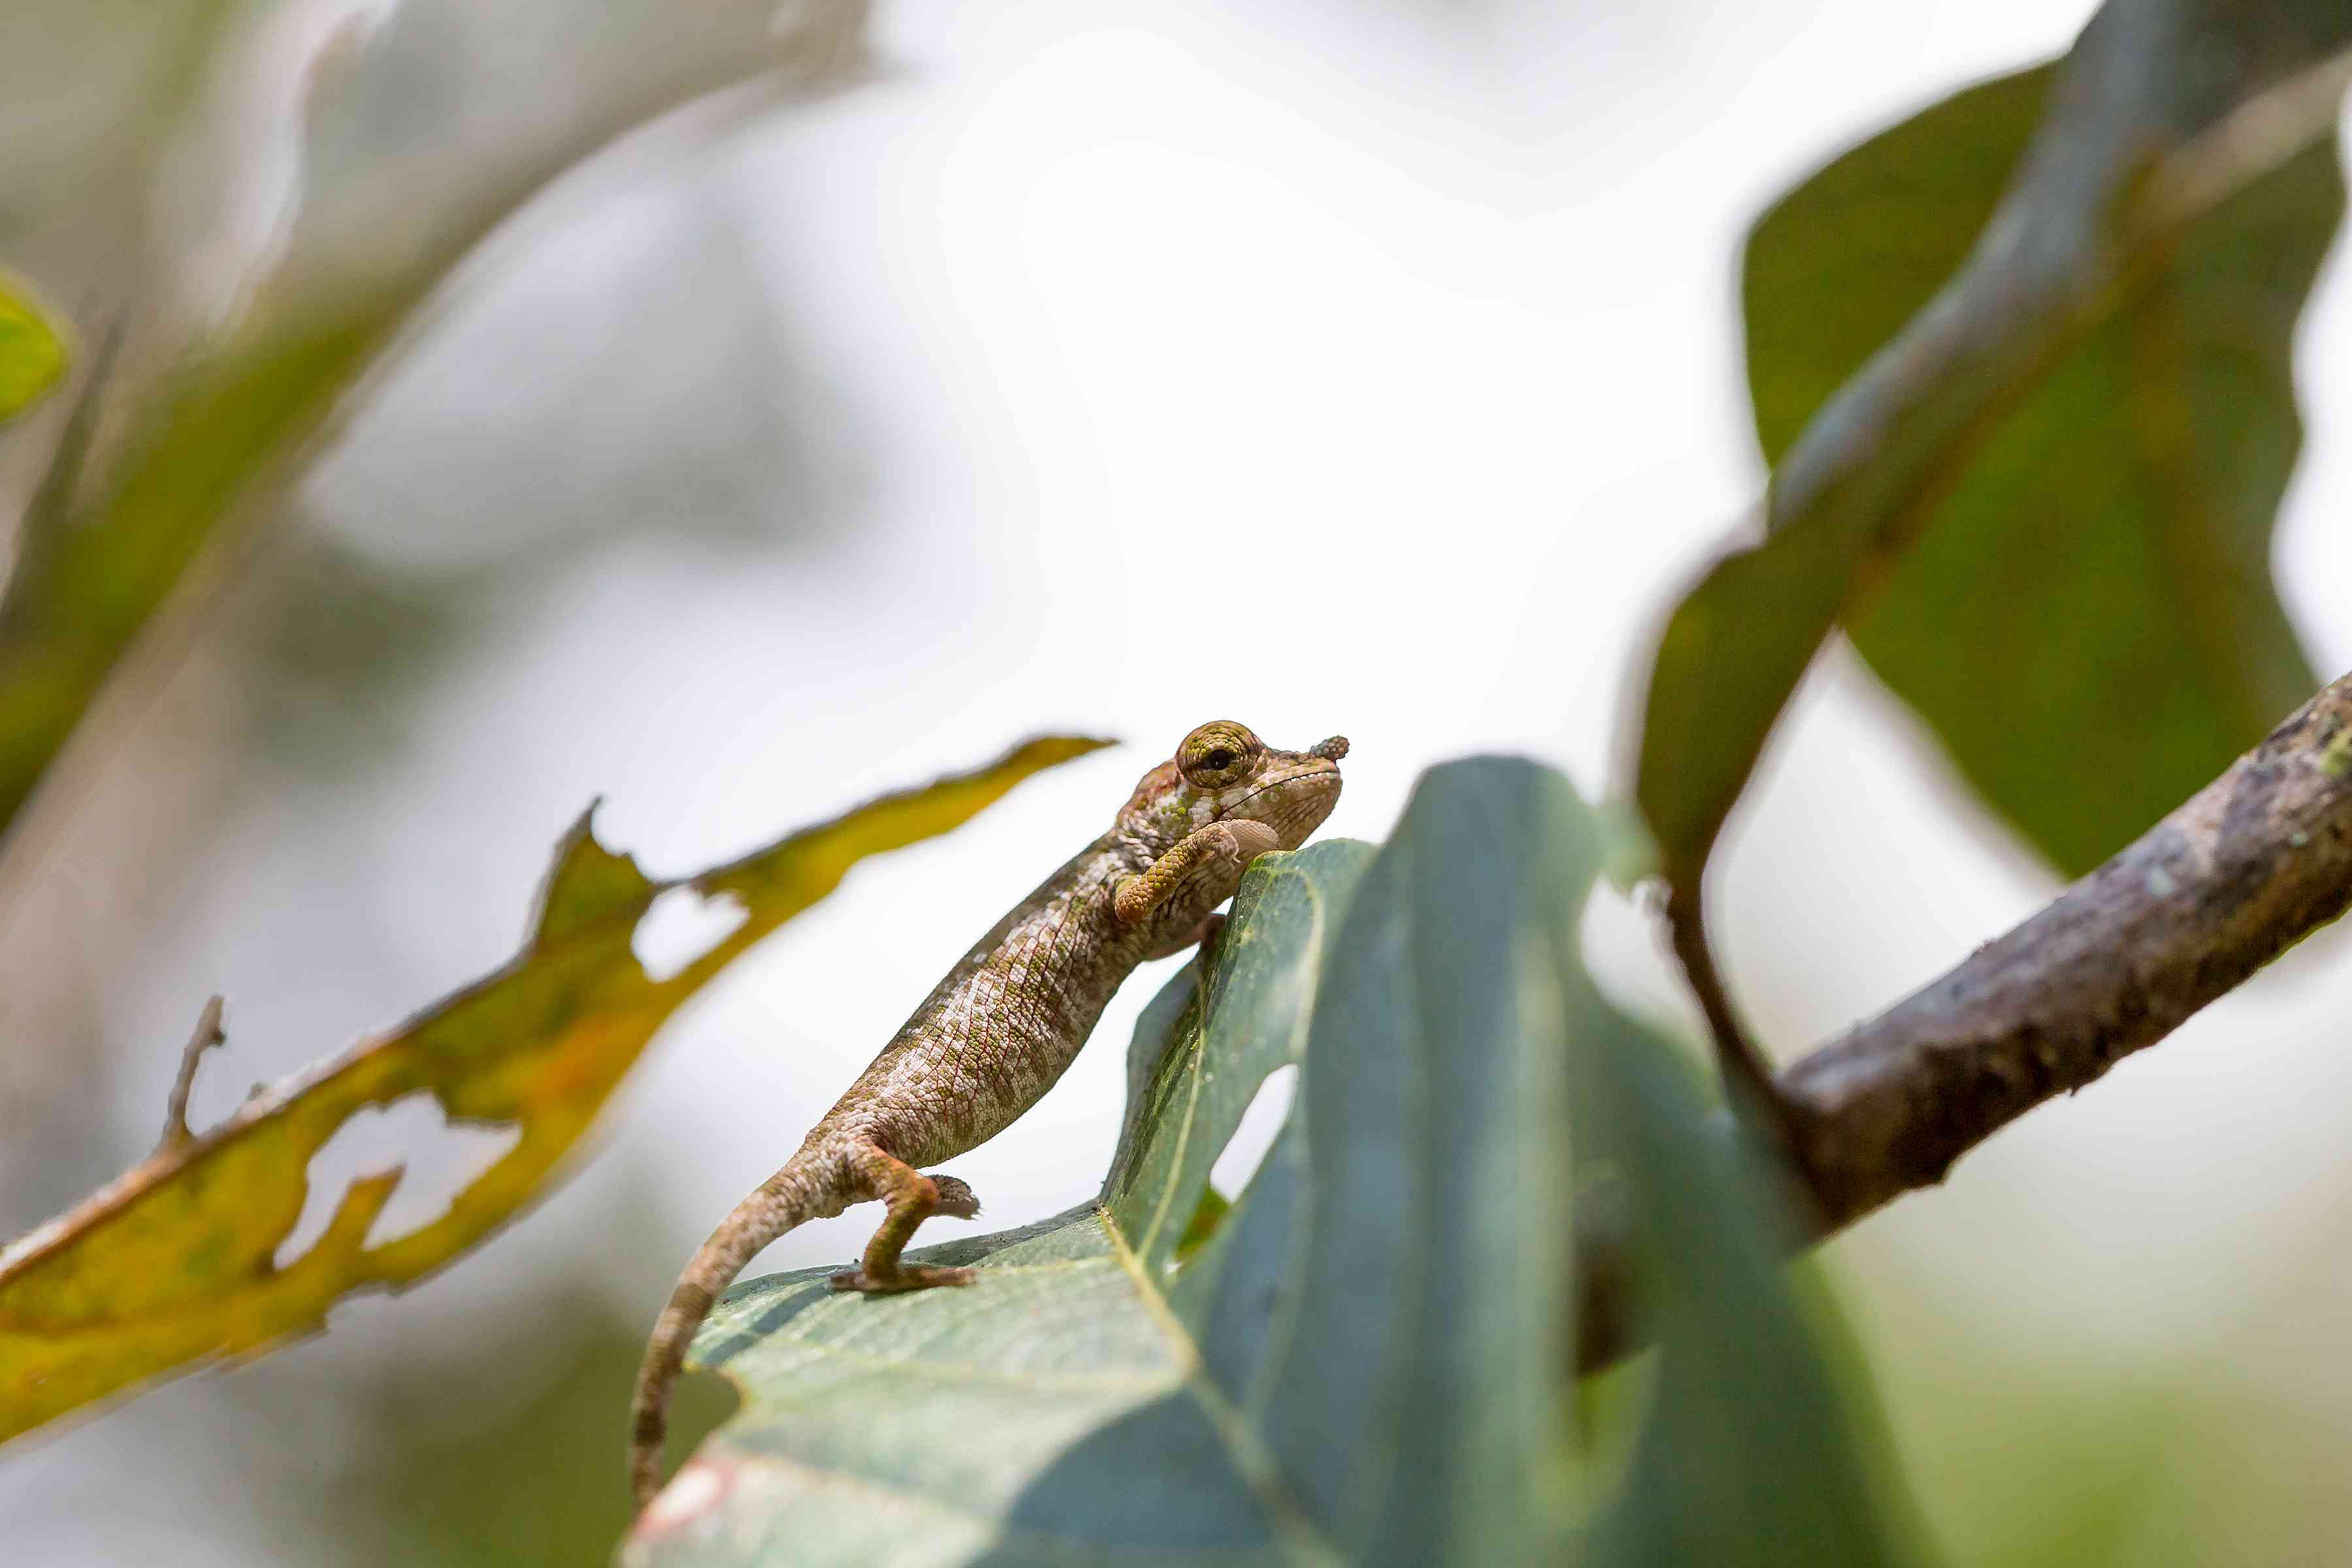 Small nose-horned chameleon climbing on leaf